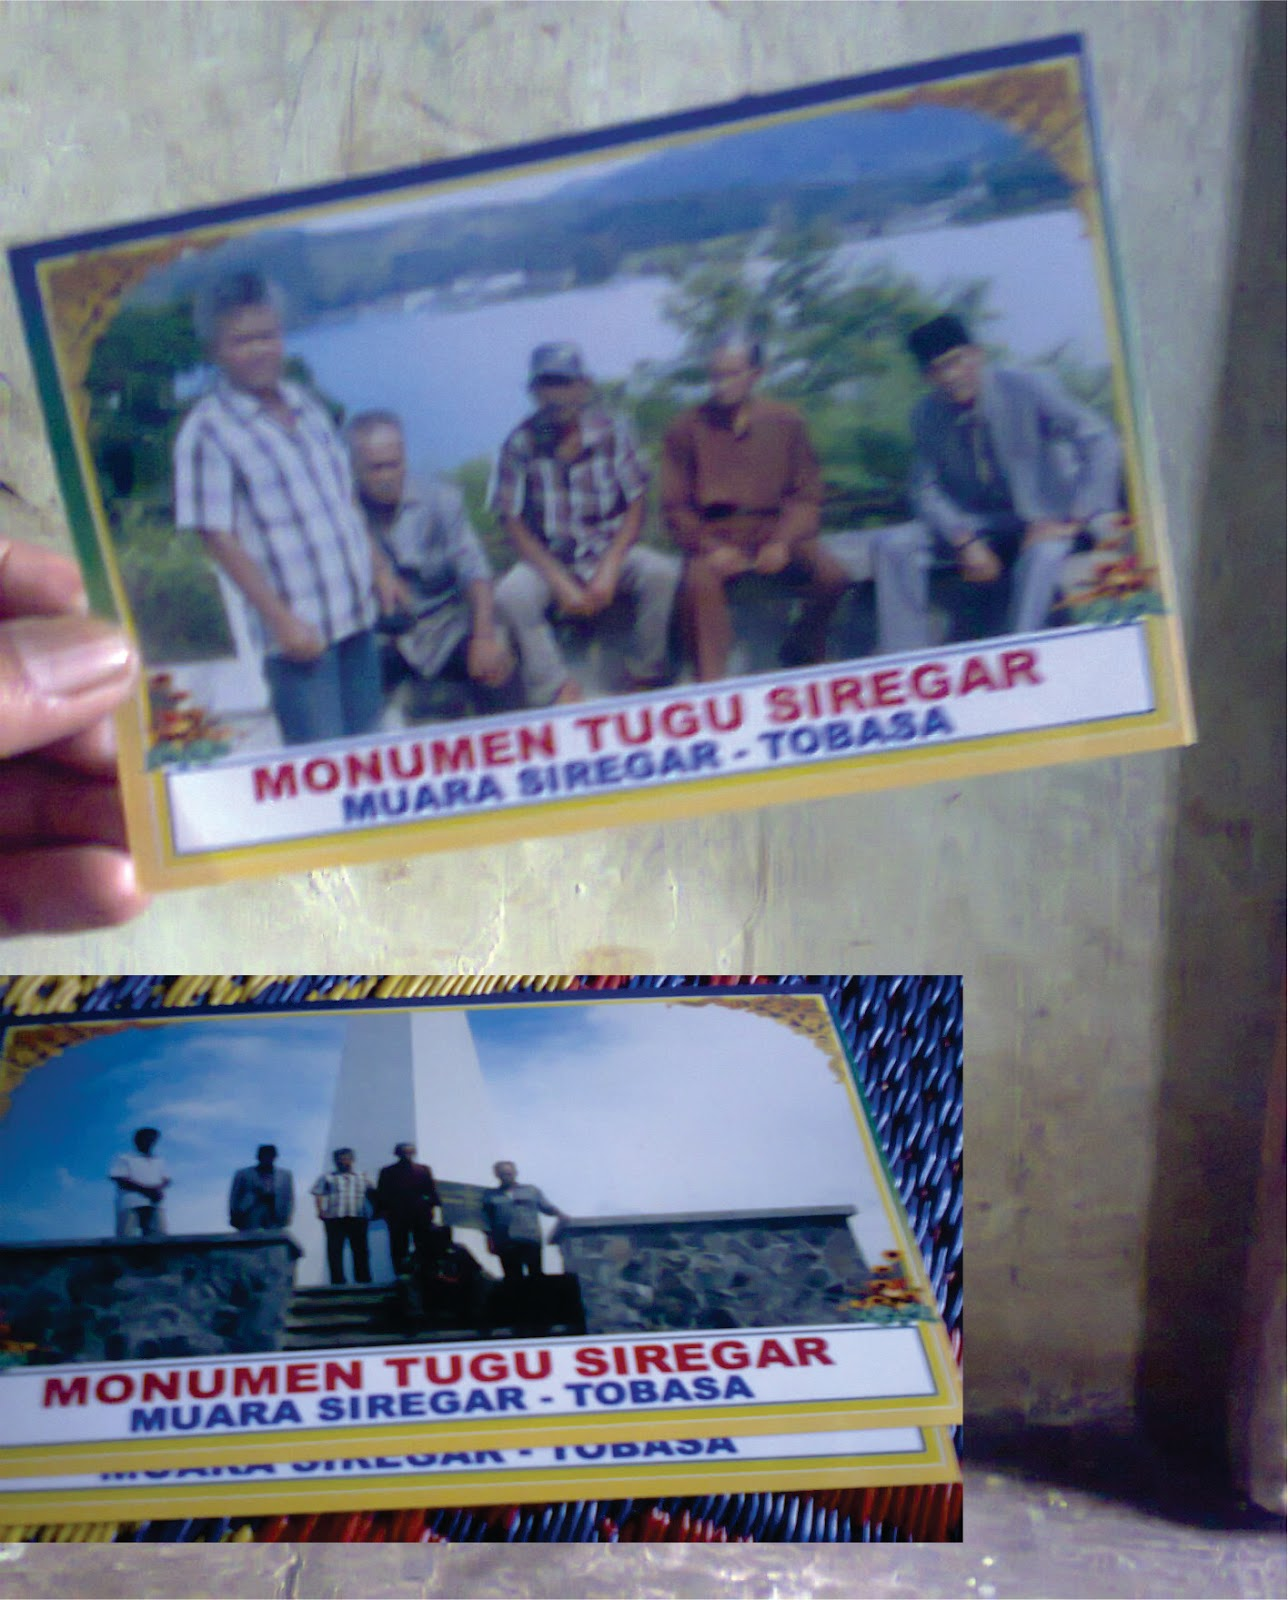 Macam Status Angkola Facebook Paposmaroha Silsilah | New Style for ...